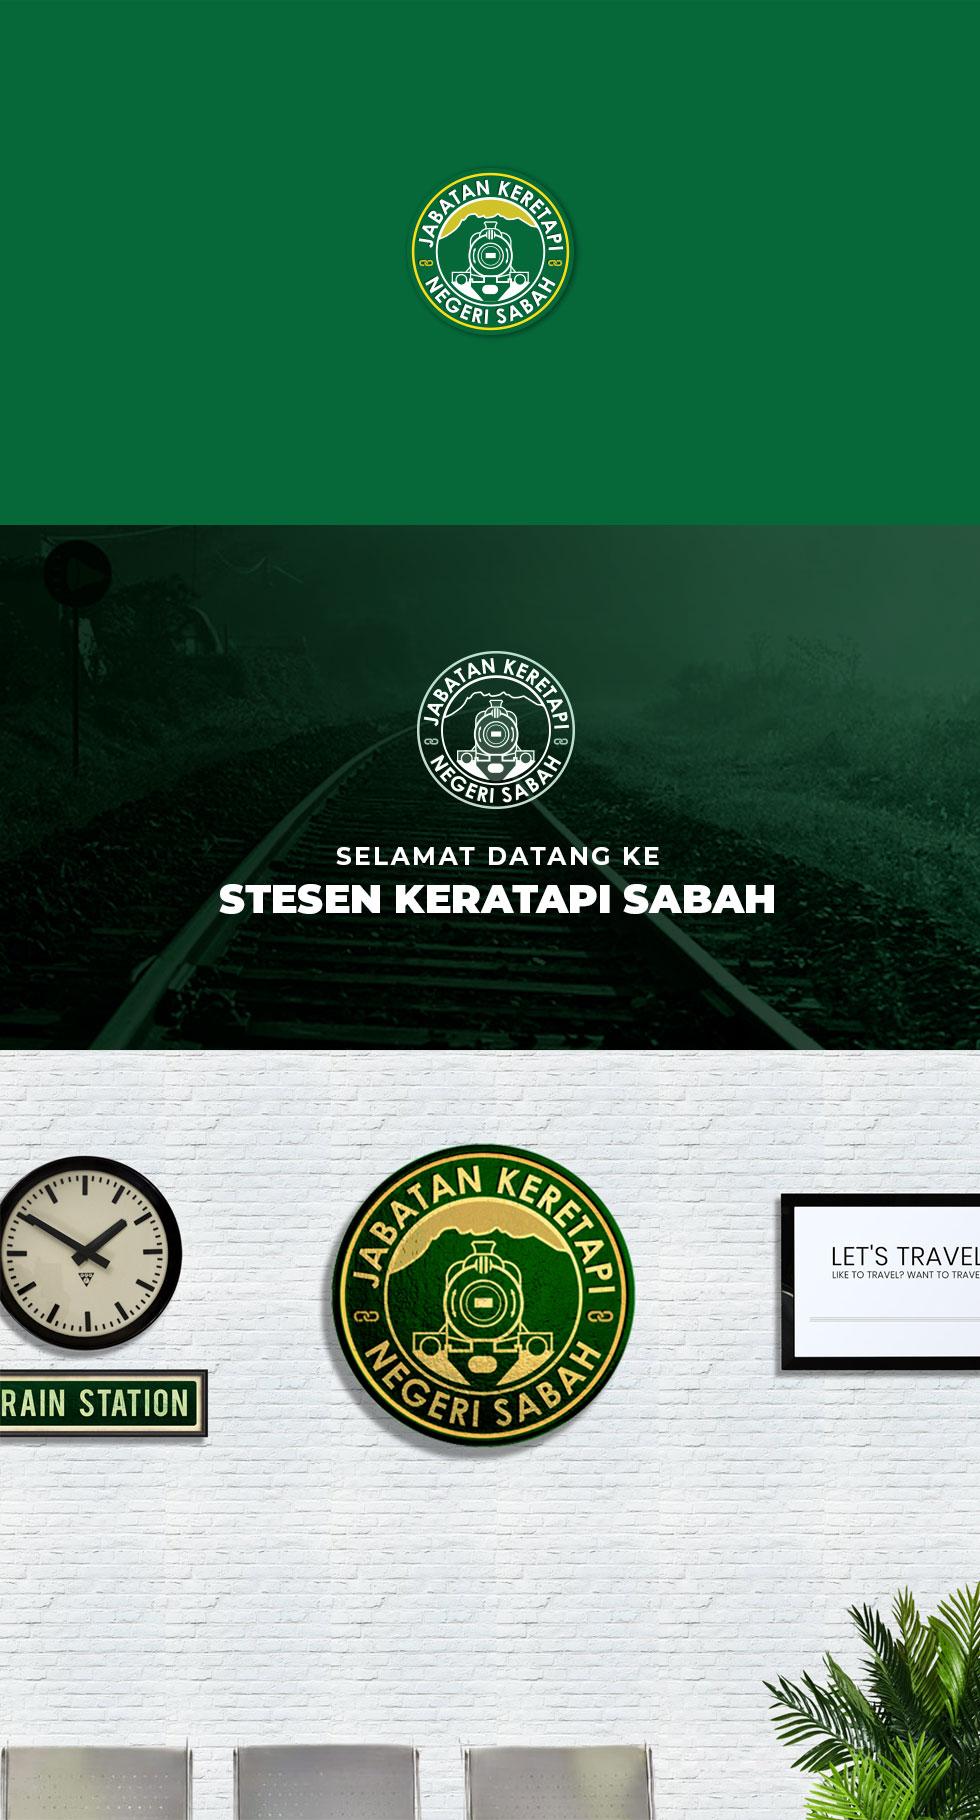 Jabatan Keratapi Sabah